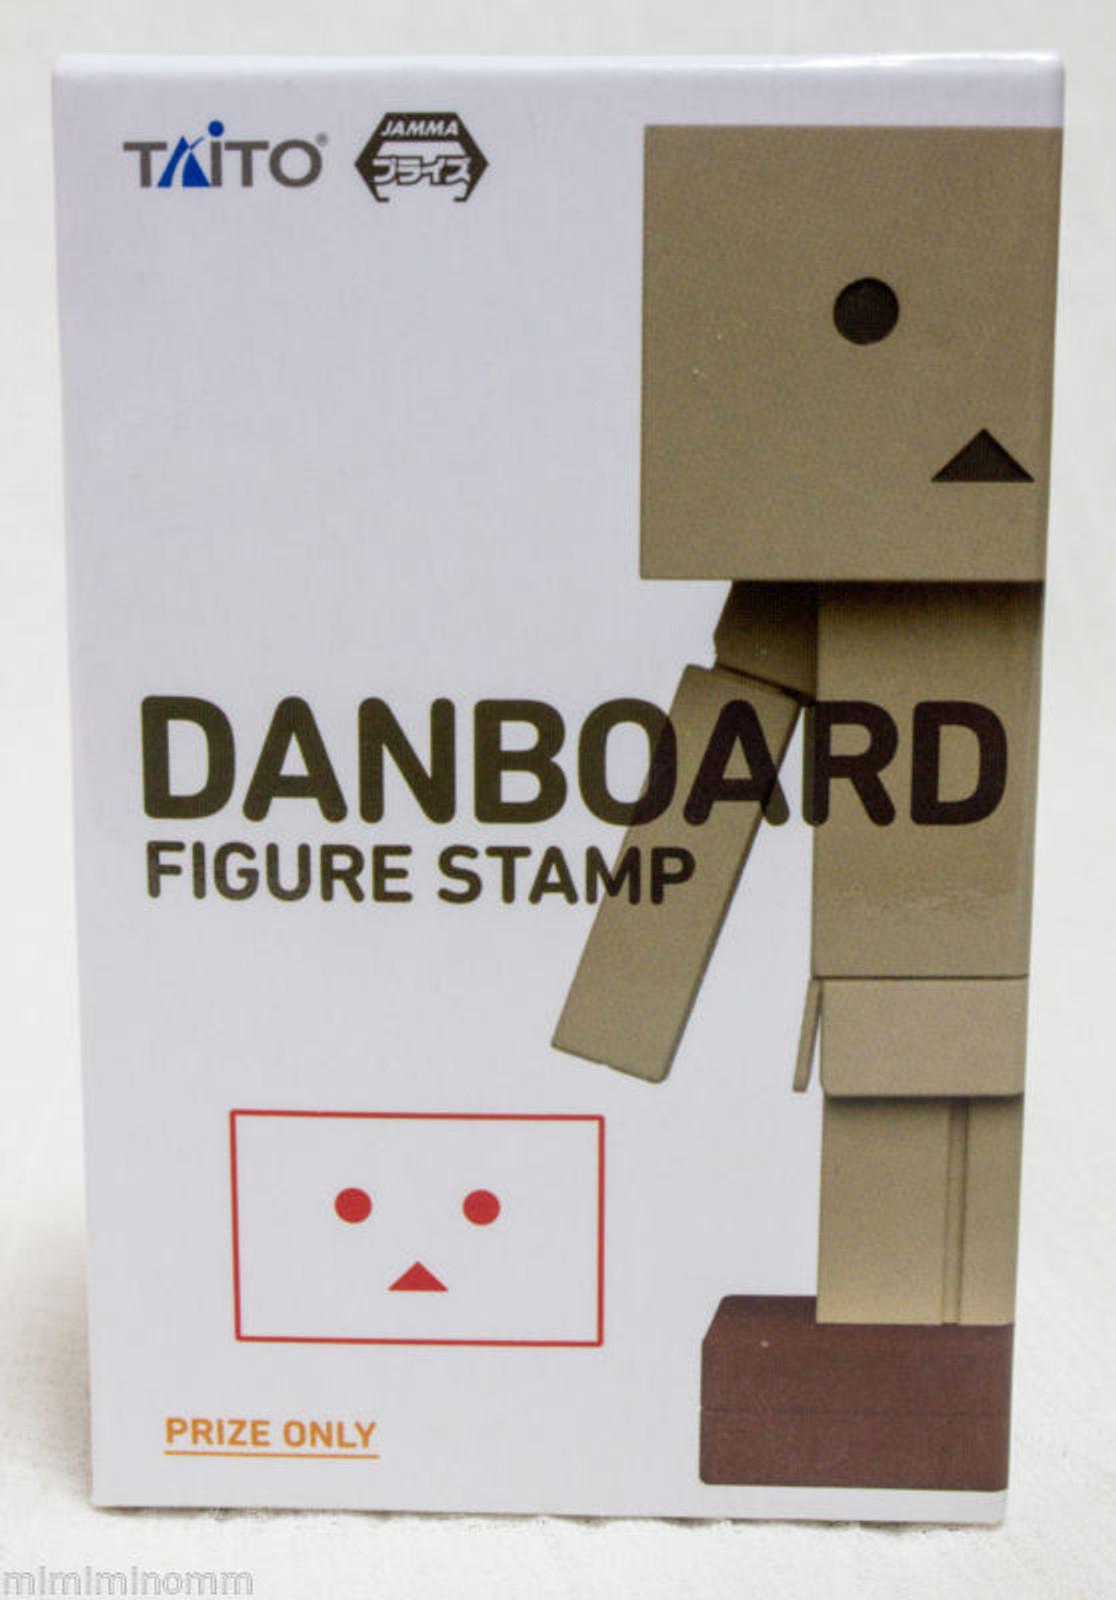 Yotsuba& Danboard Dambo Figure Stamp A type JAPAN ANIME MANGA